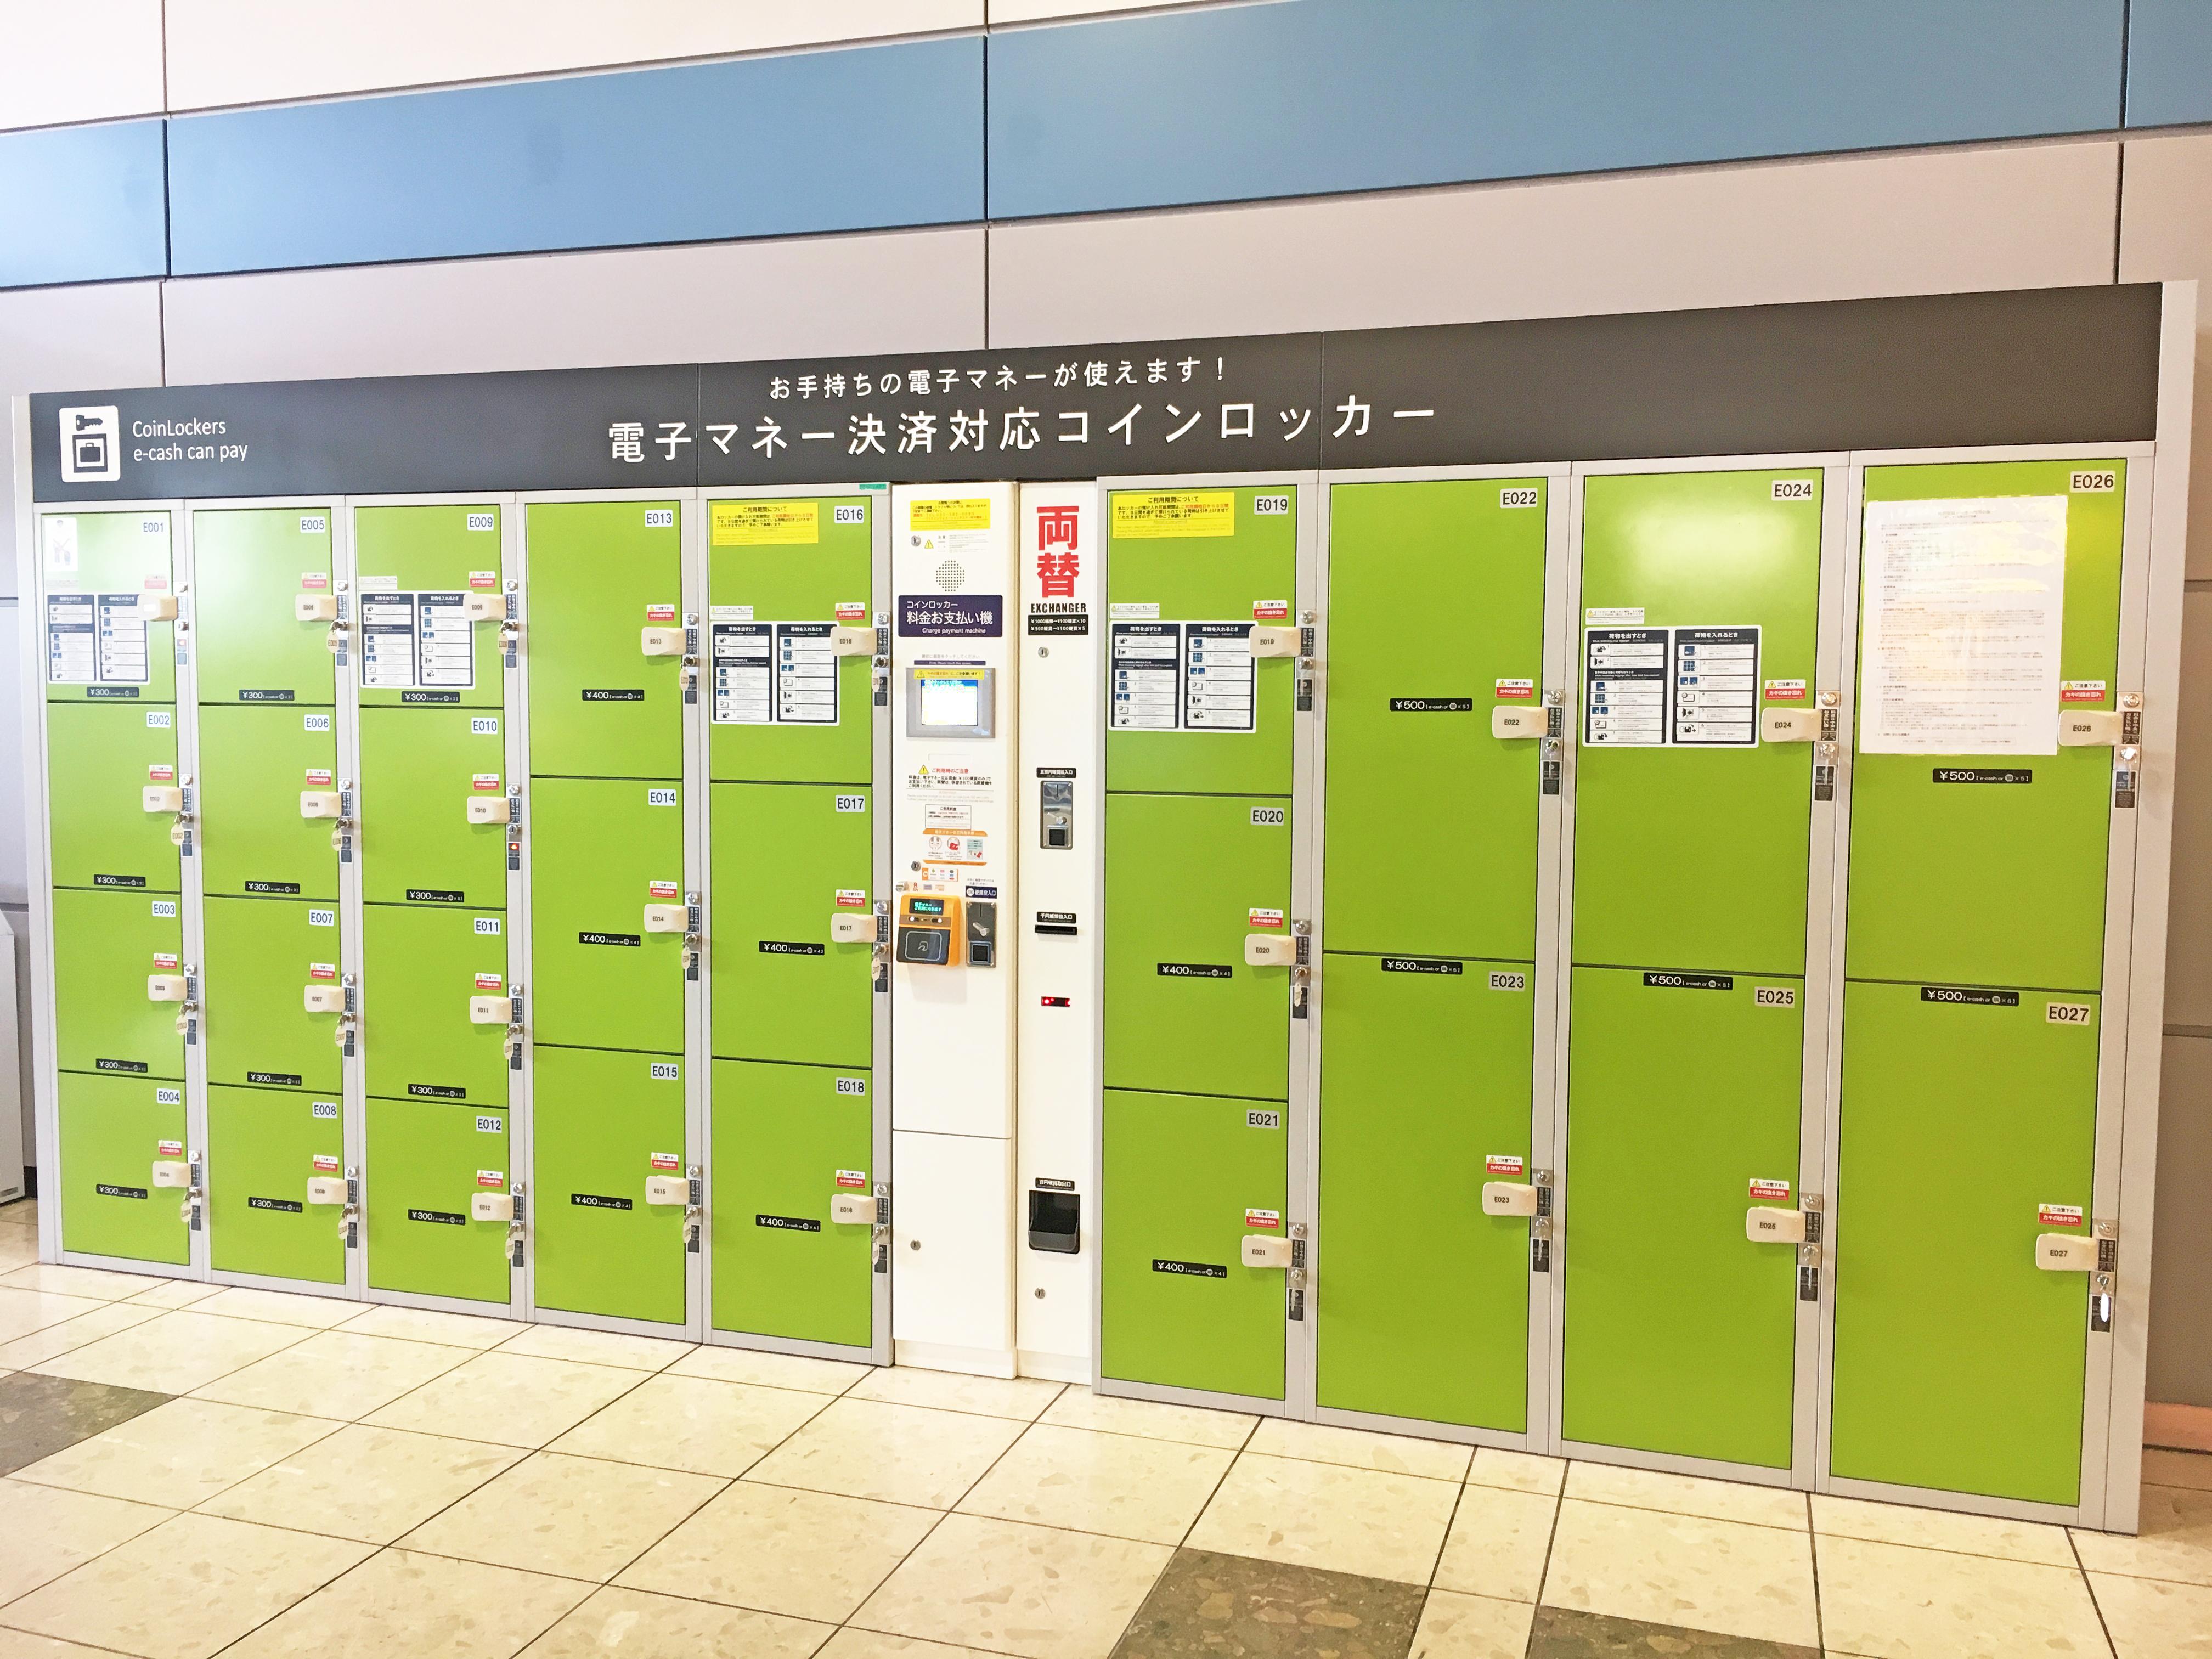 1樓西側儲物櫃